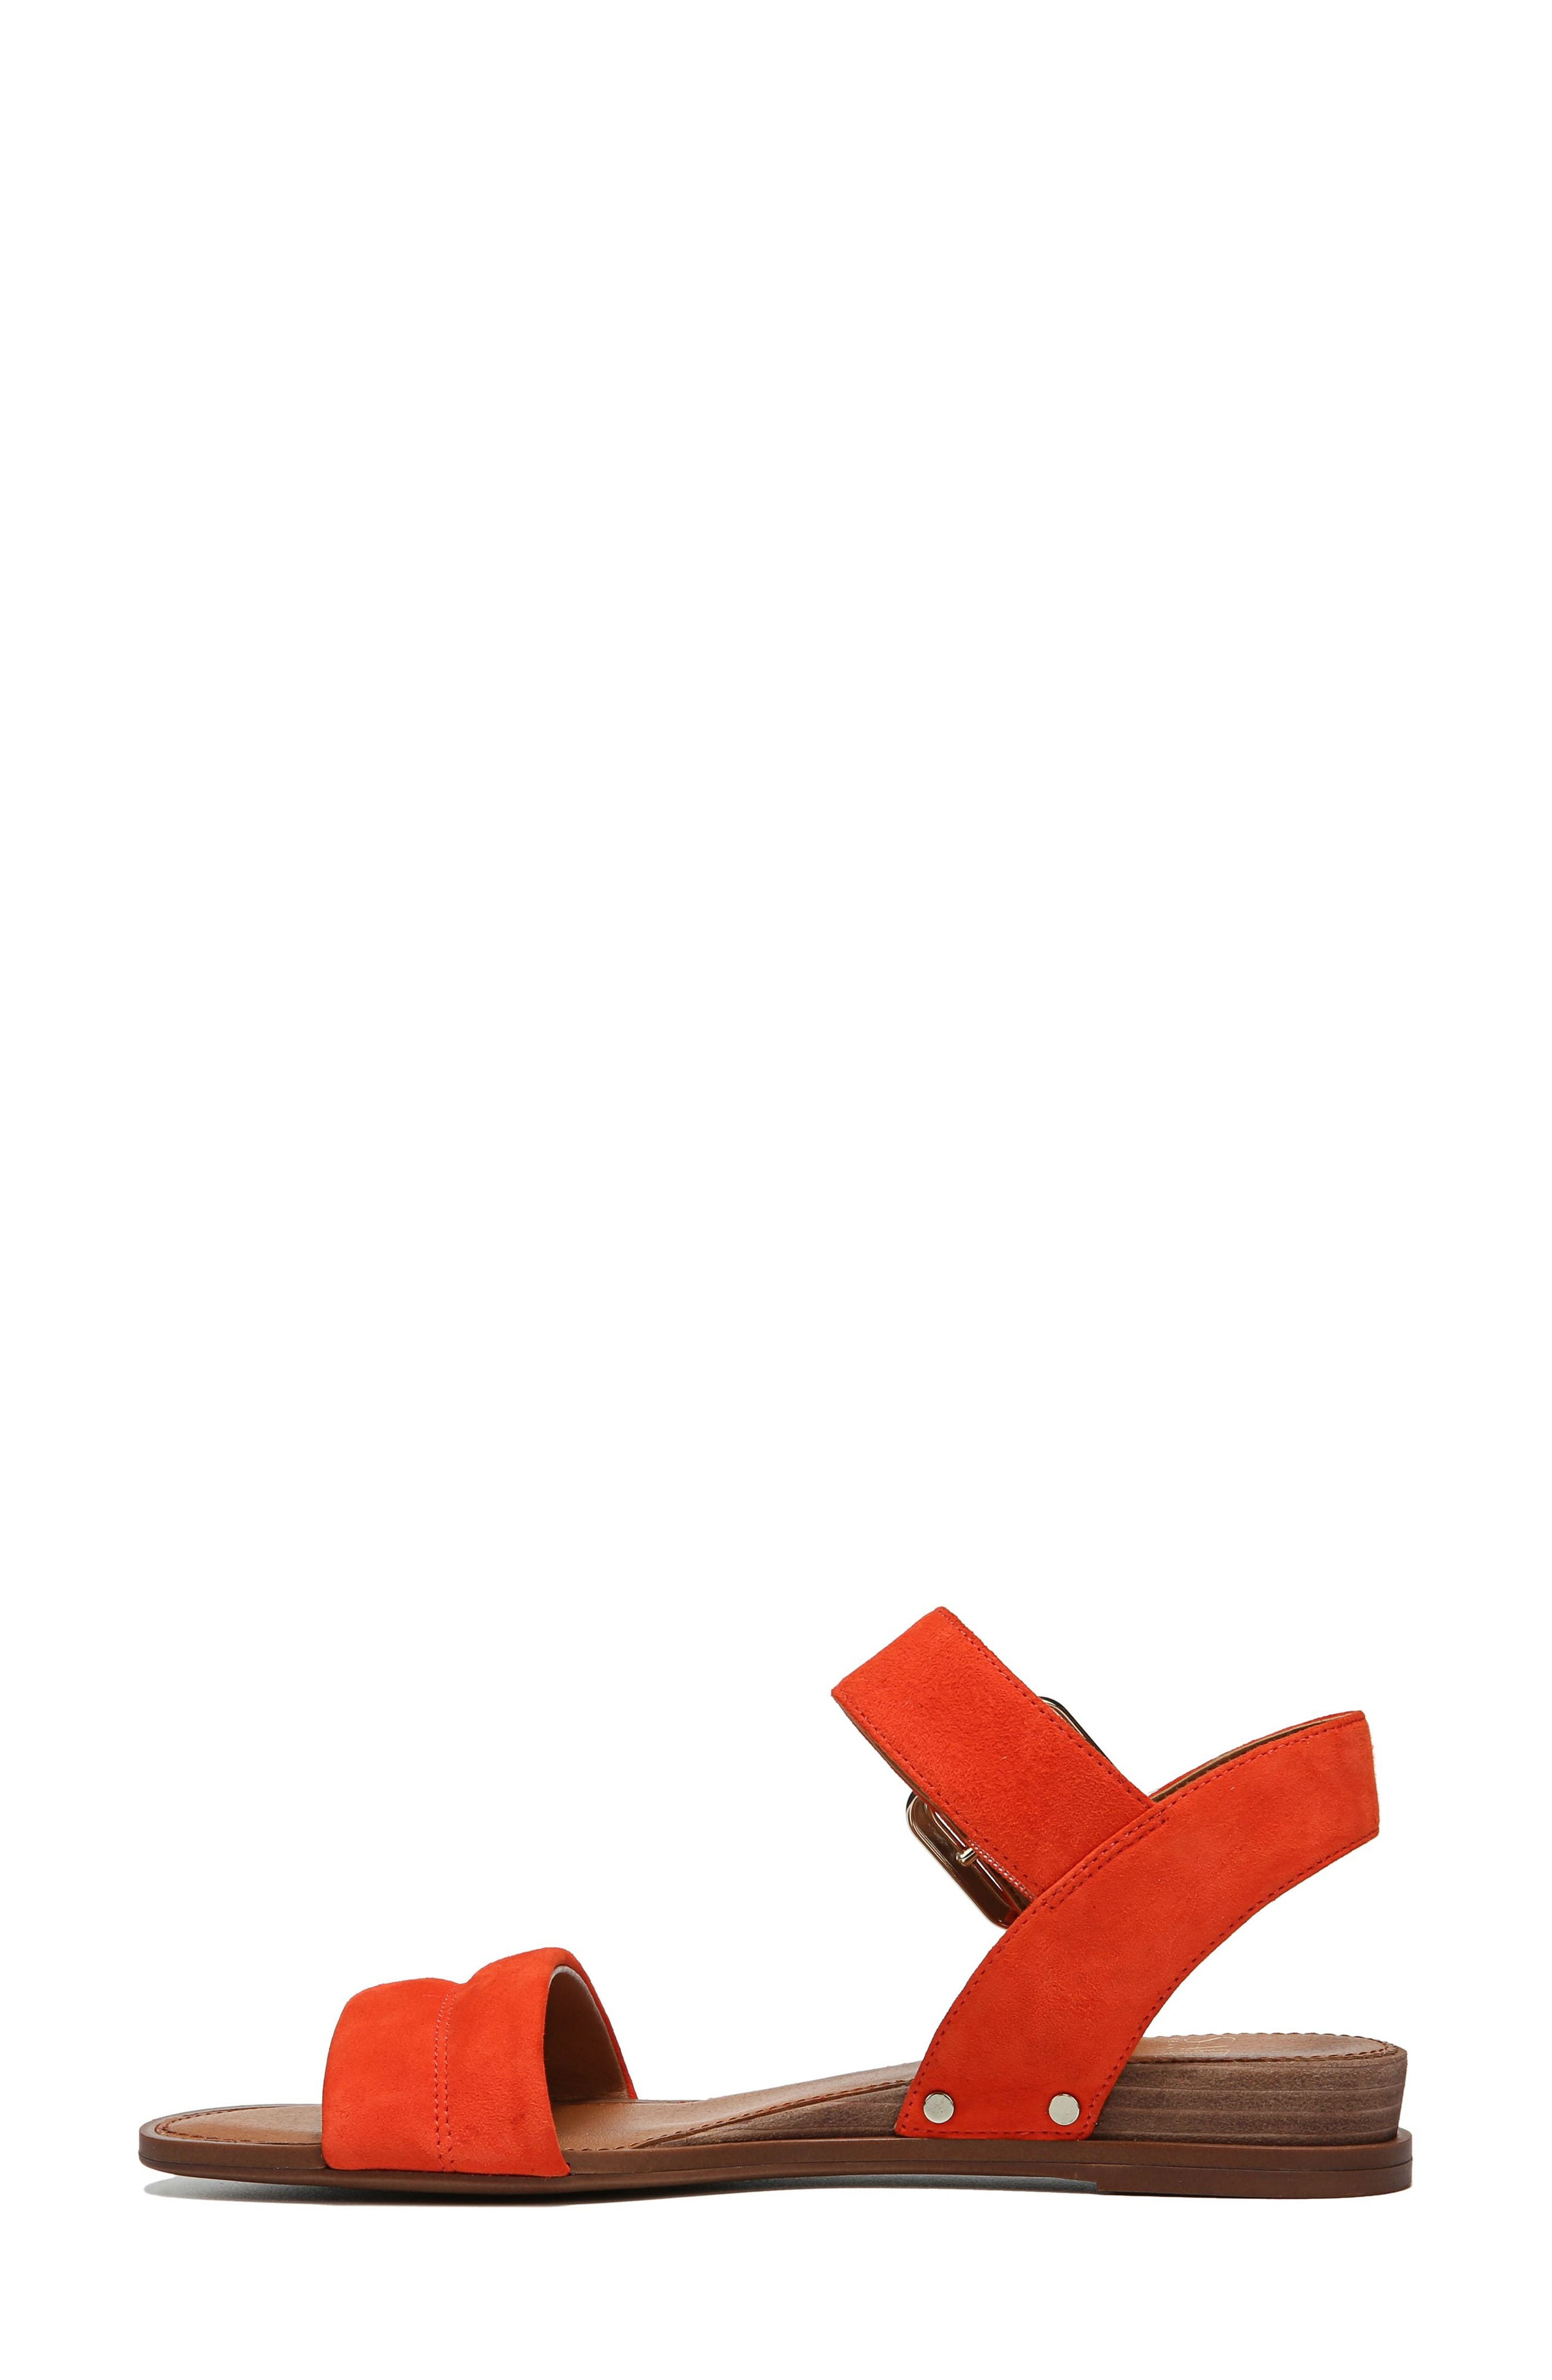 Patterson Low Wedge Sandal,                             Alternate thumbnail 21, color,